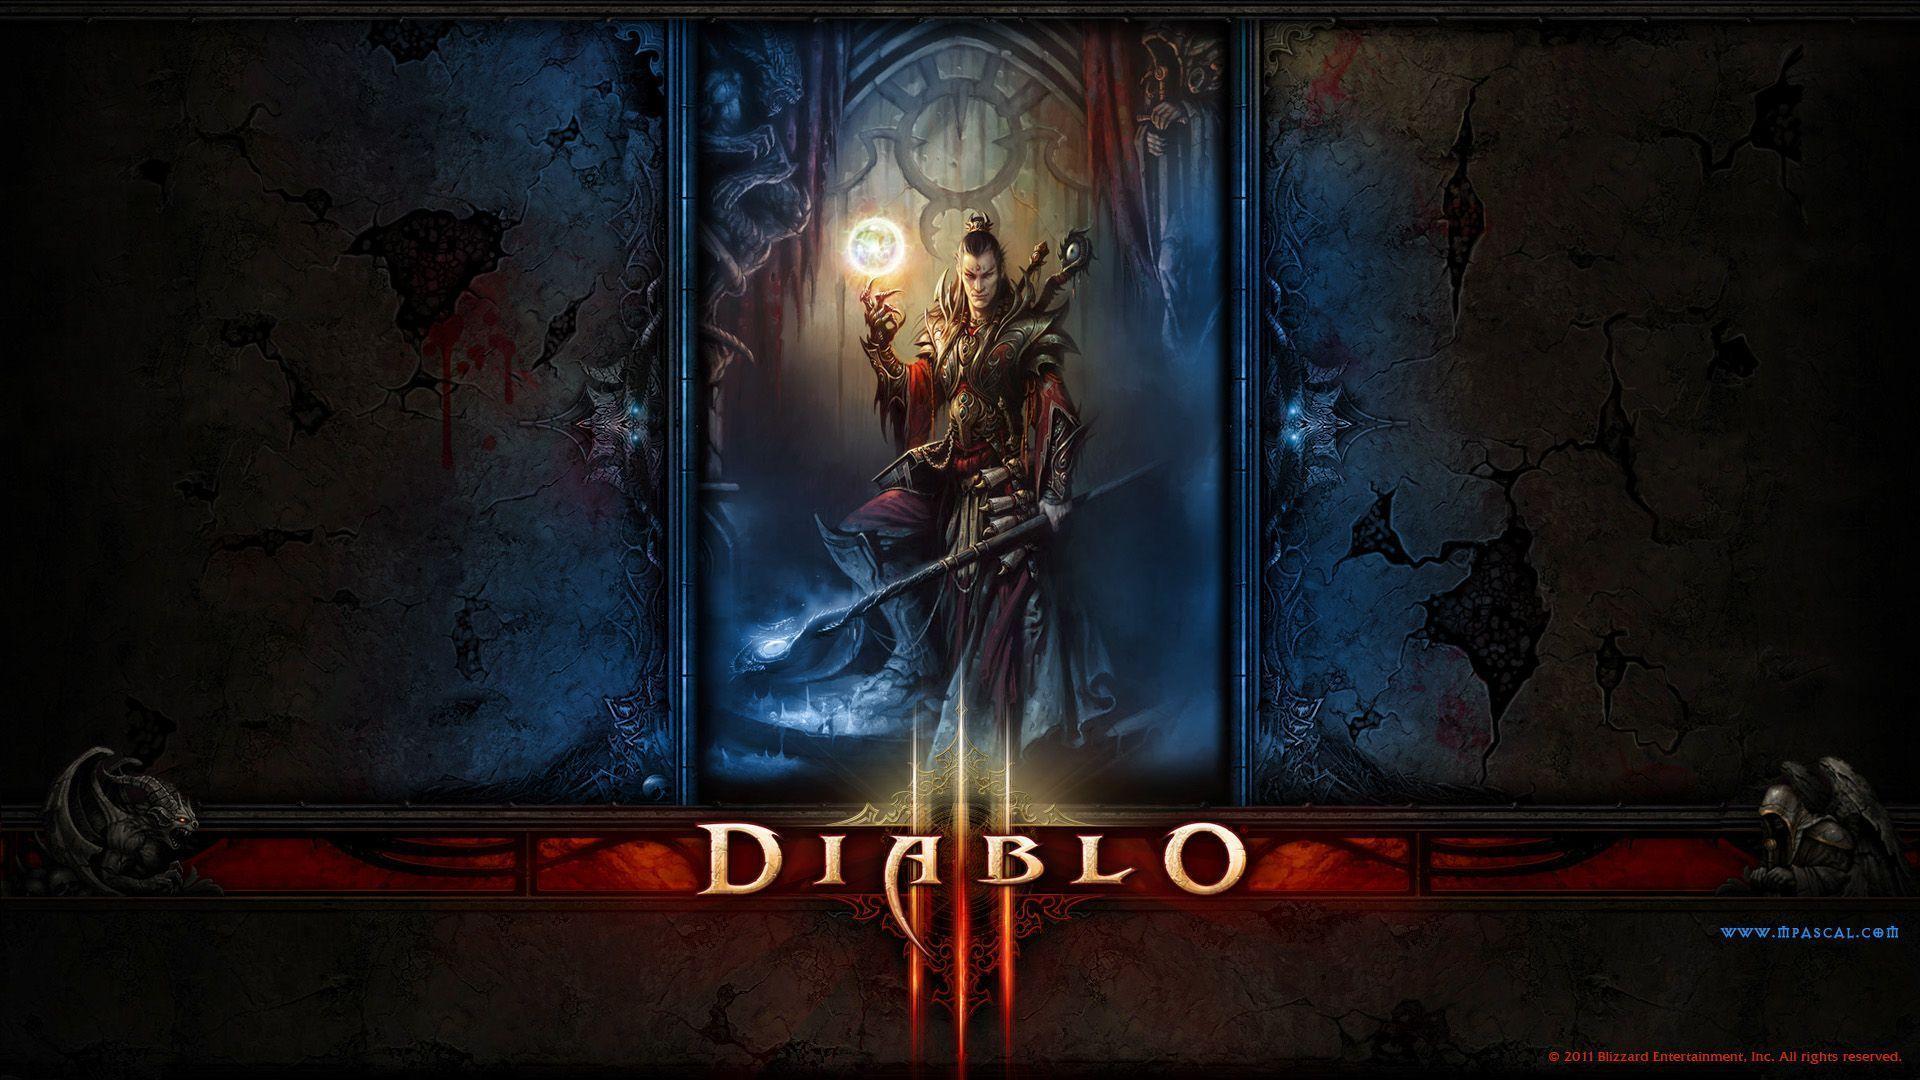 Diablo 3 Wallpaper 1920x1080: Diablo 3 Wallpapers